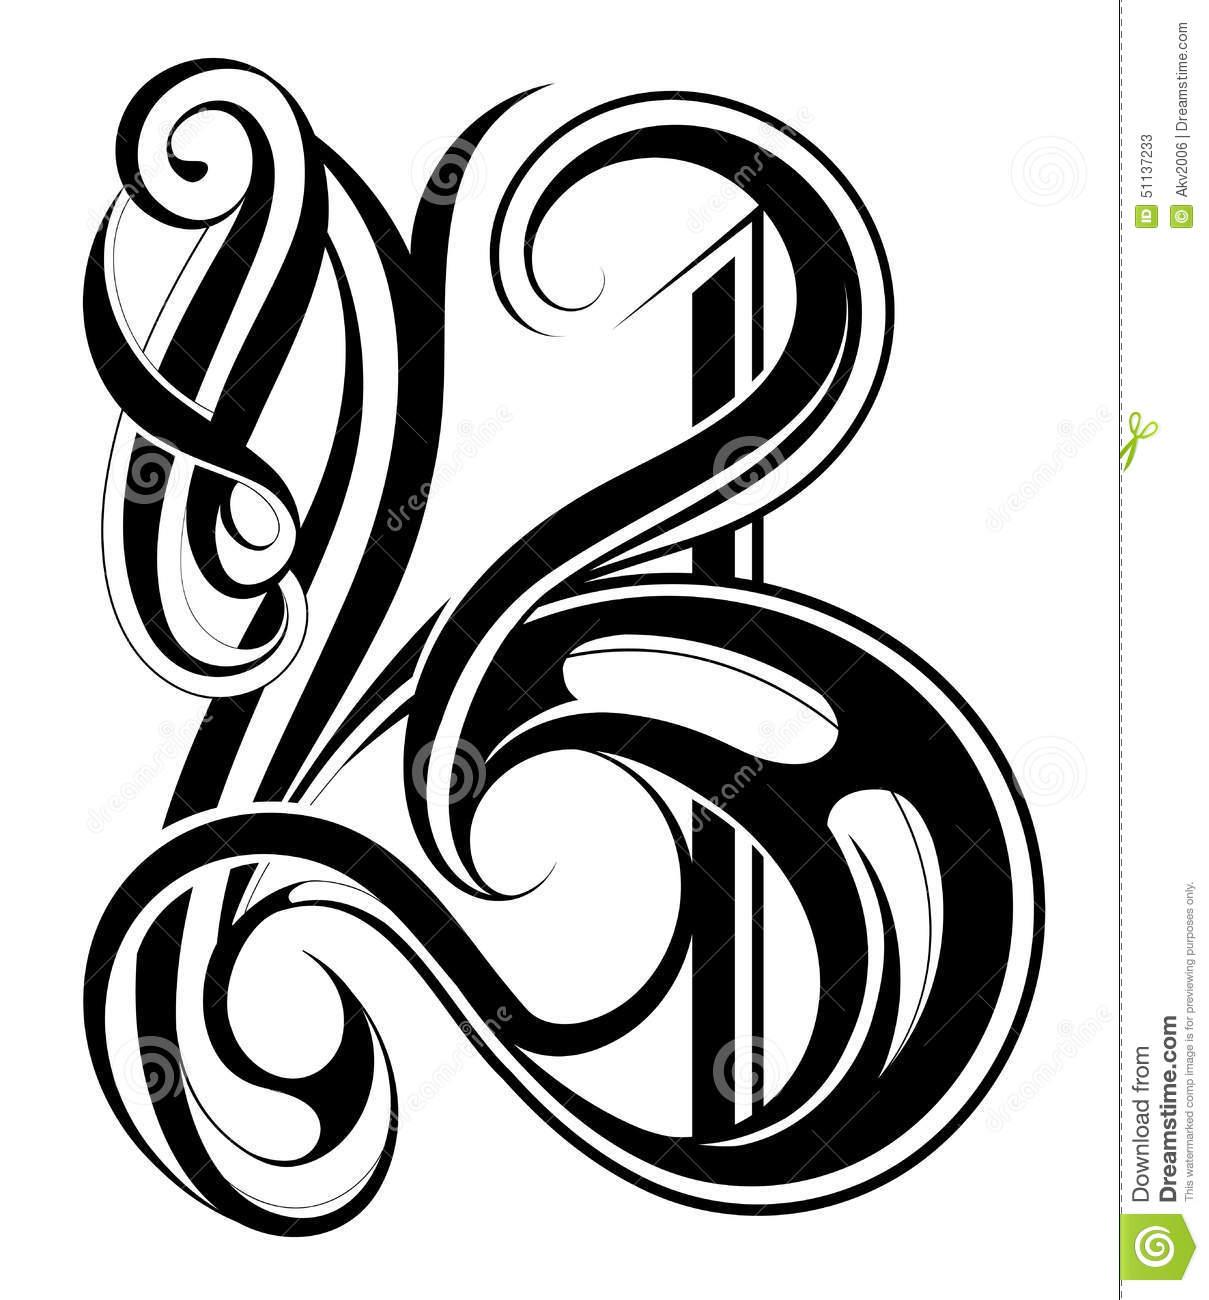 Letter b clipart free calligraphy svg transparent Calligraphic Letter B Stock Vector - Image: 51137233 svg transparent